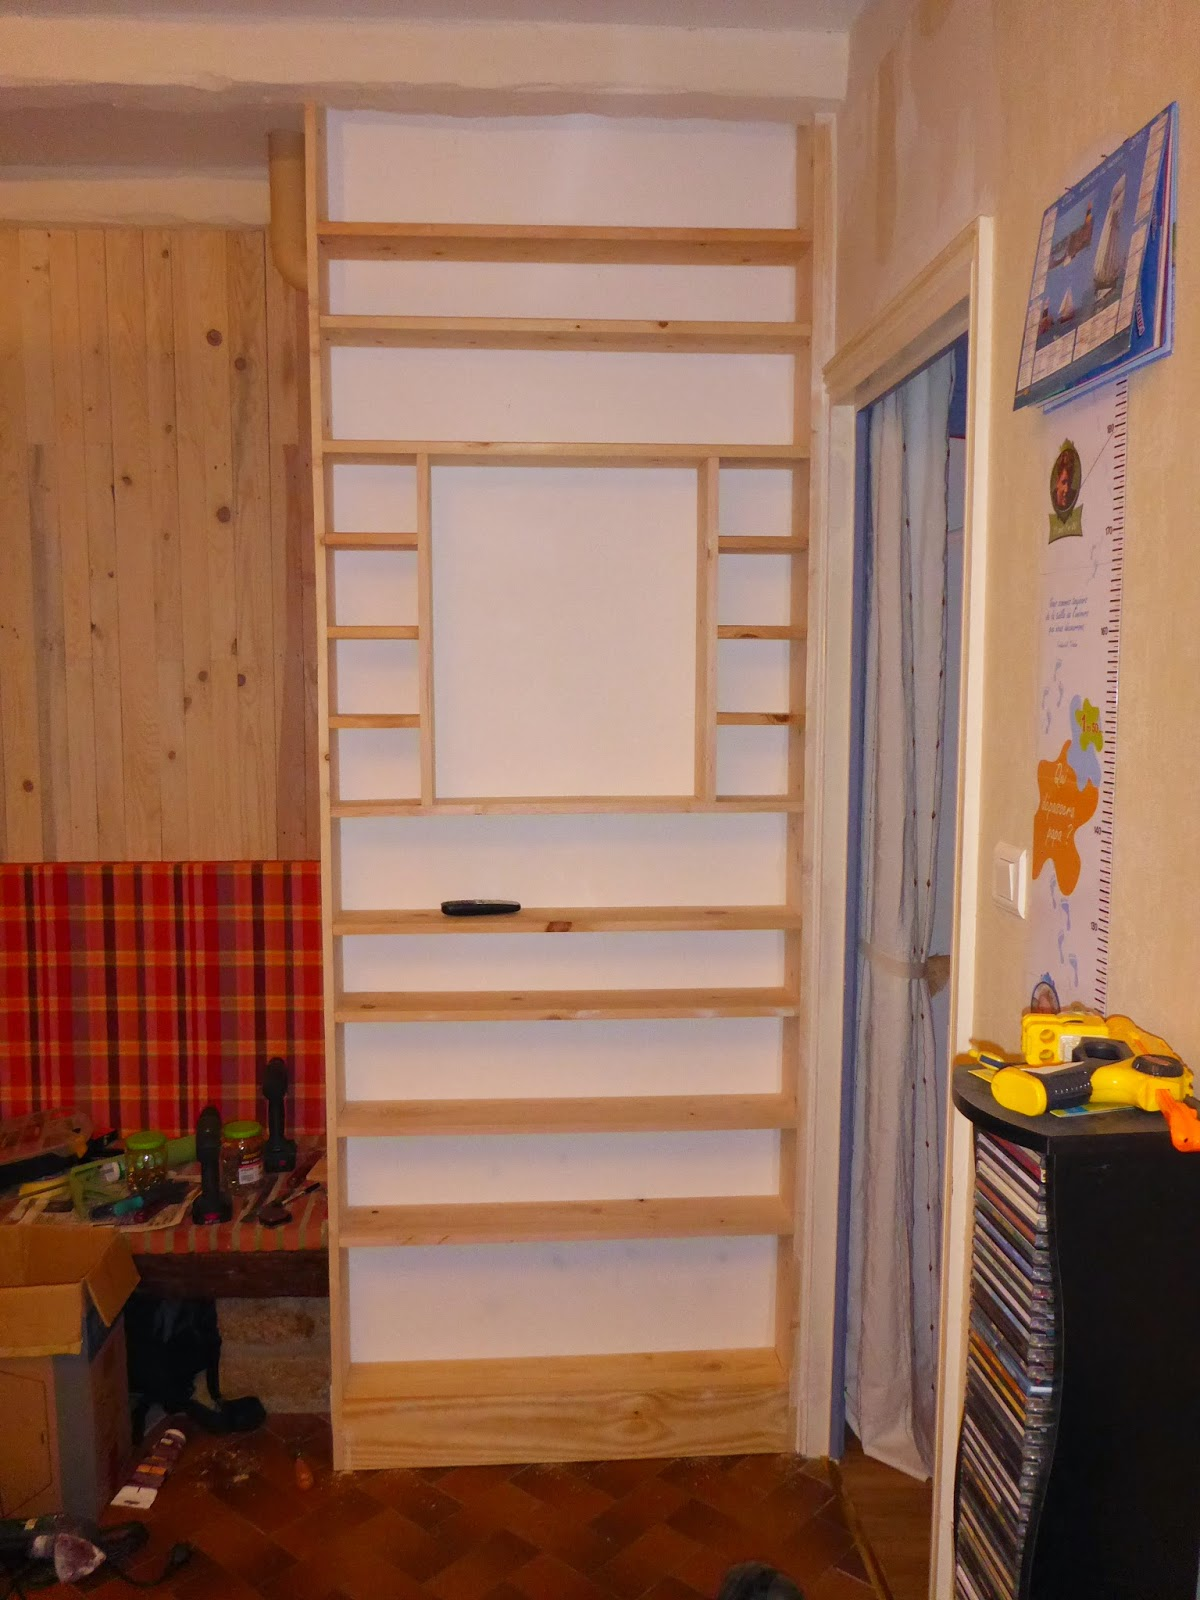 ludo la bricole etag res cd et livres de poche. Black Bedroom Furniture Sets. Home Design Ideas